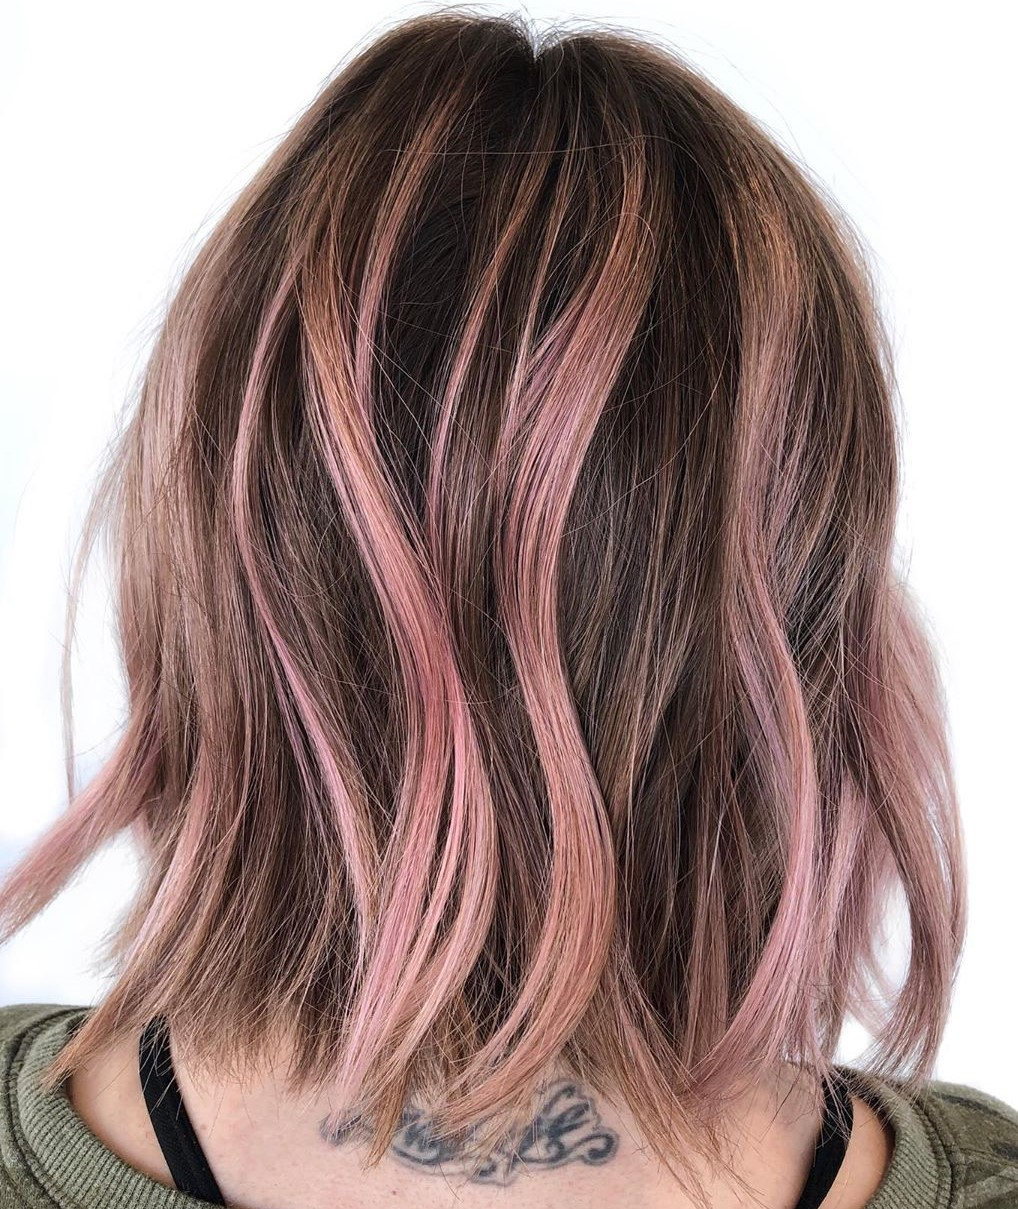 30 Unbelievably Cool Pink Hair Color Ideas For 2020 Hair Adviser